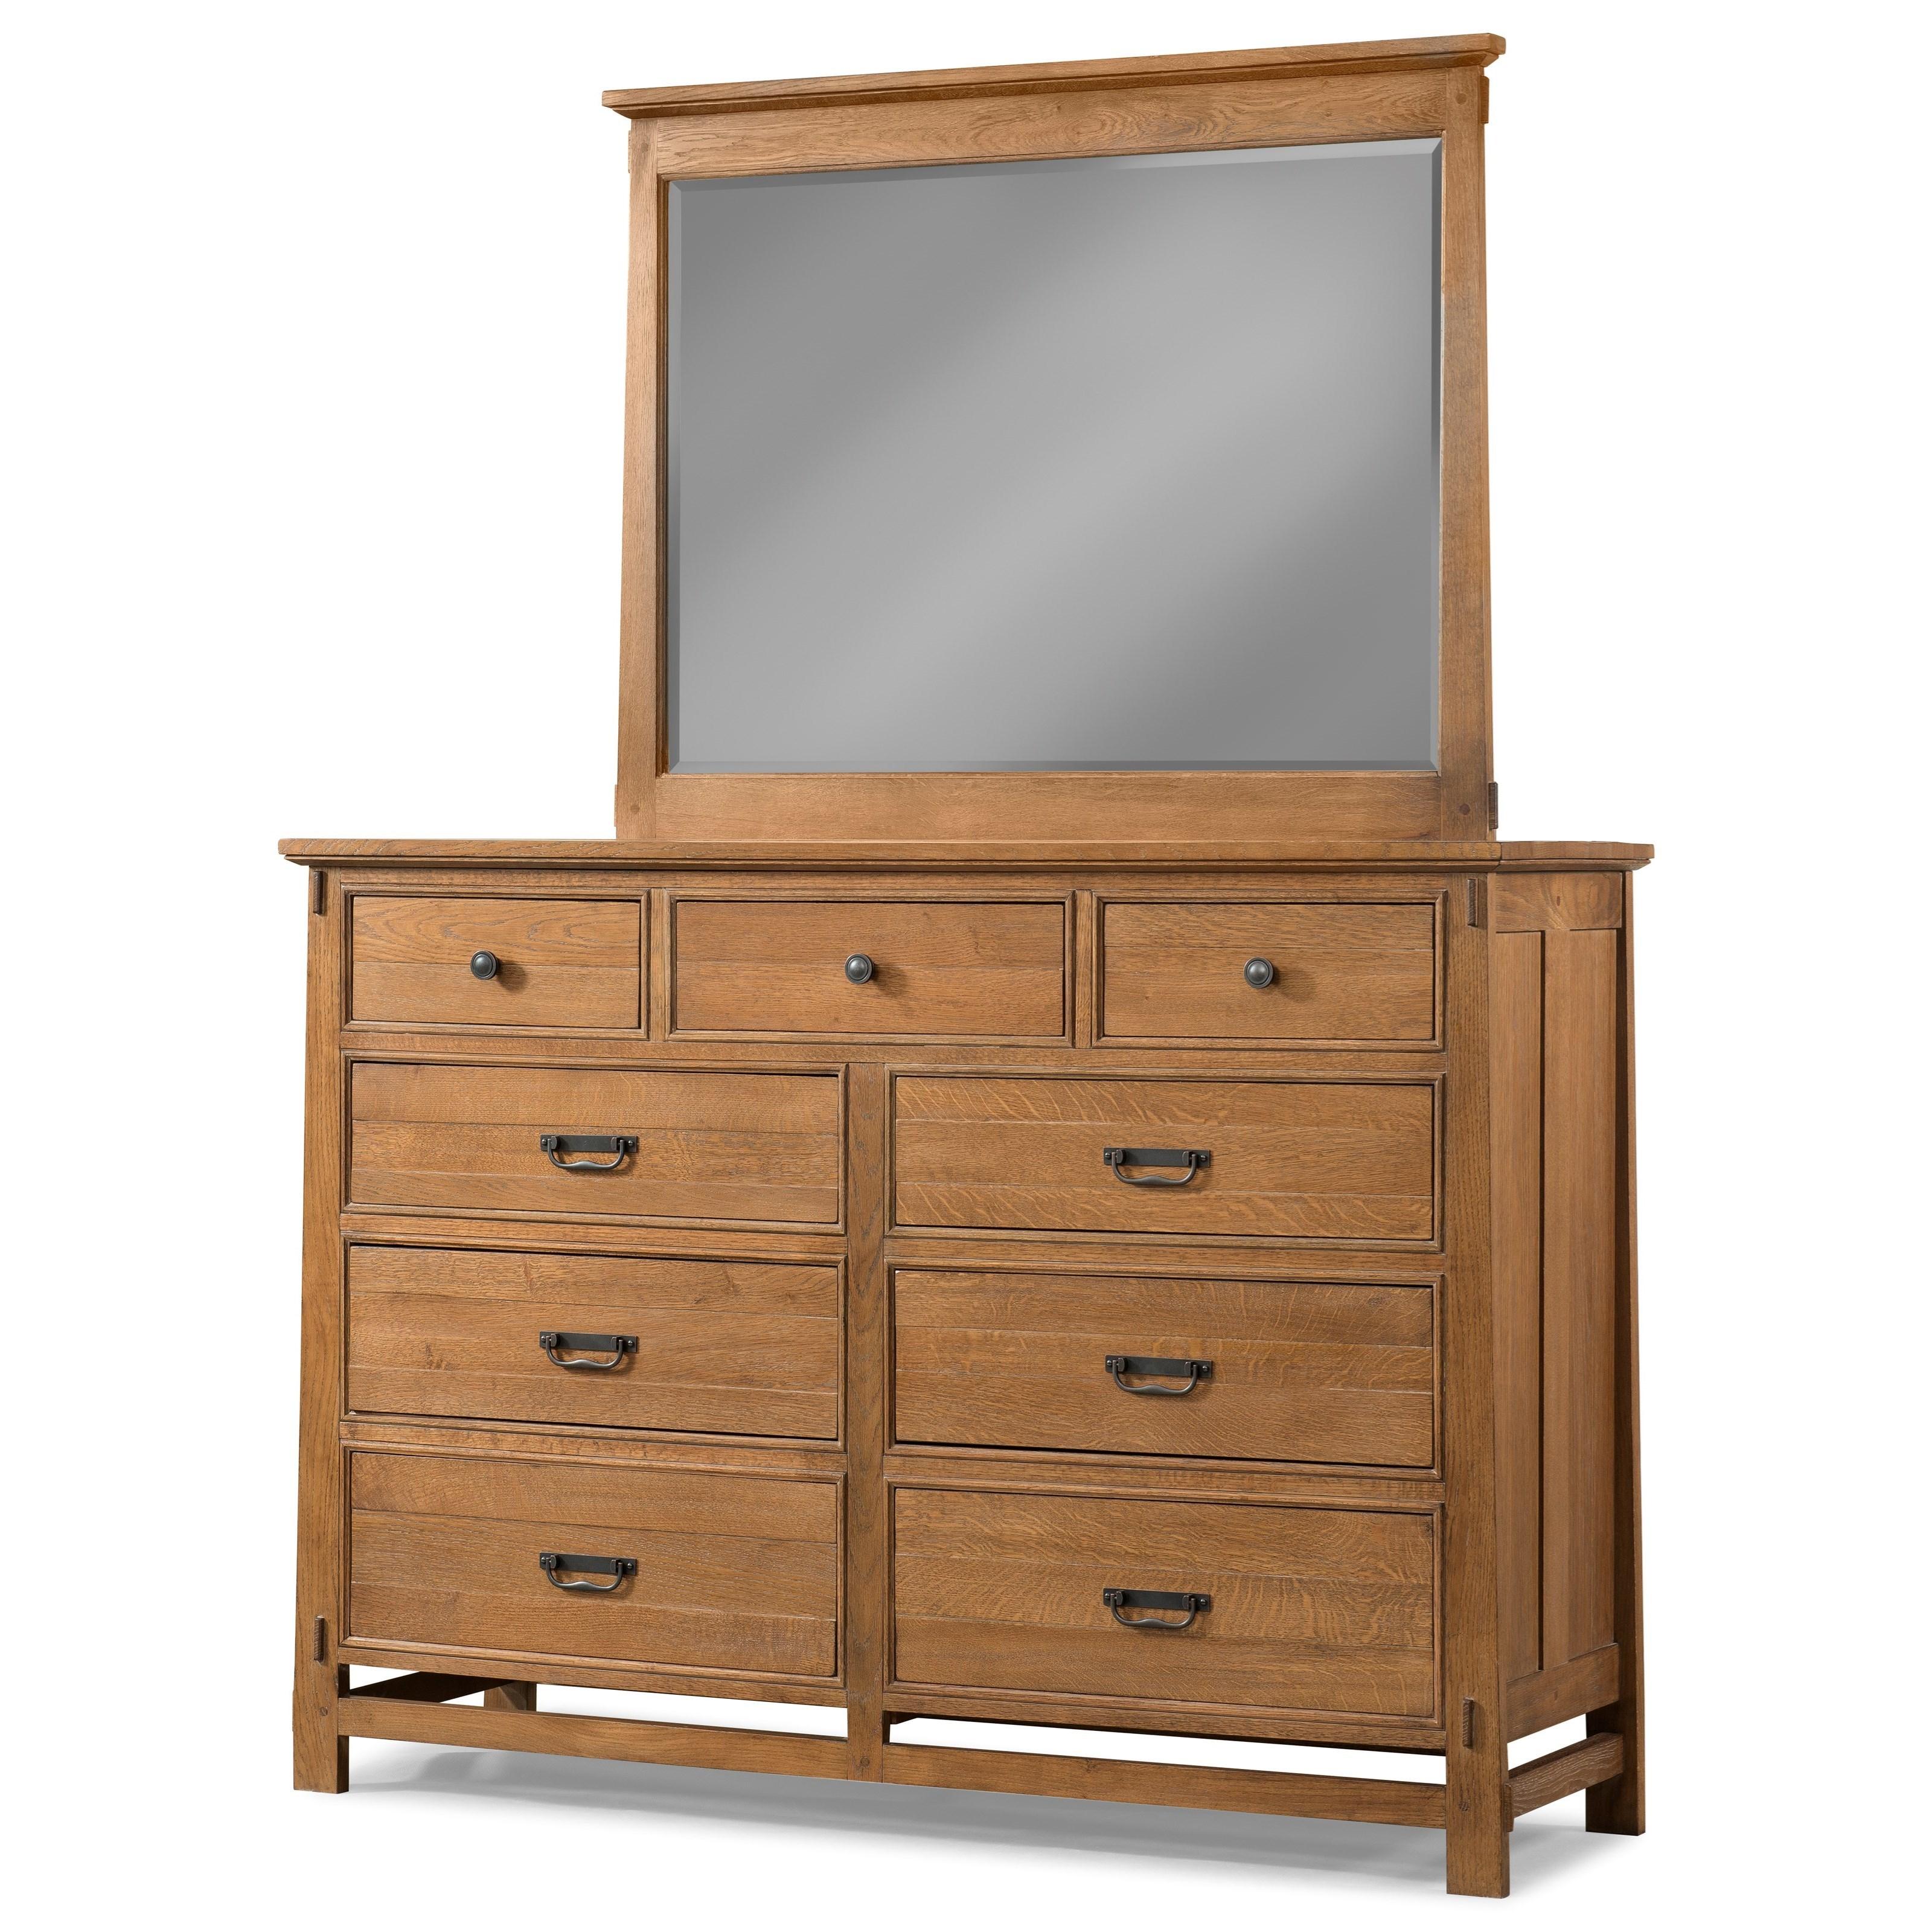 Cresent Fine Furniture Camden Dresser and Mirror Combo - Item Number: 202-101+2